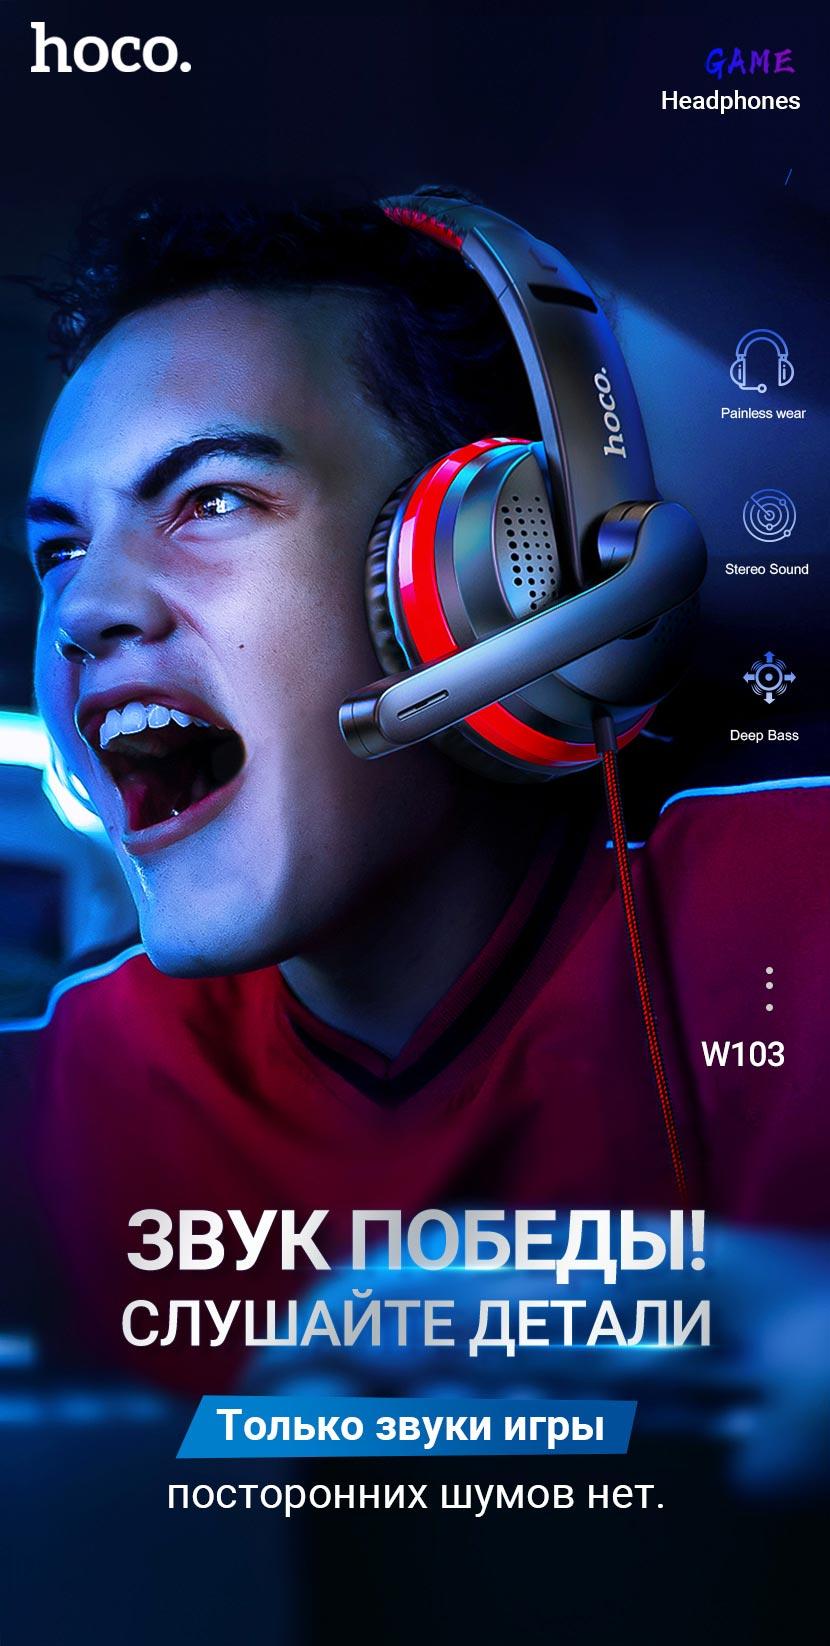 hoco news w103 magic tour gaming headphones ru